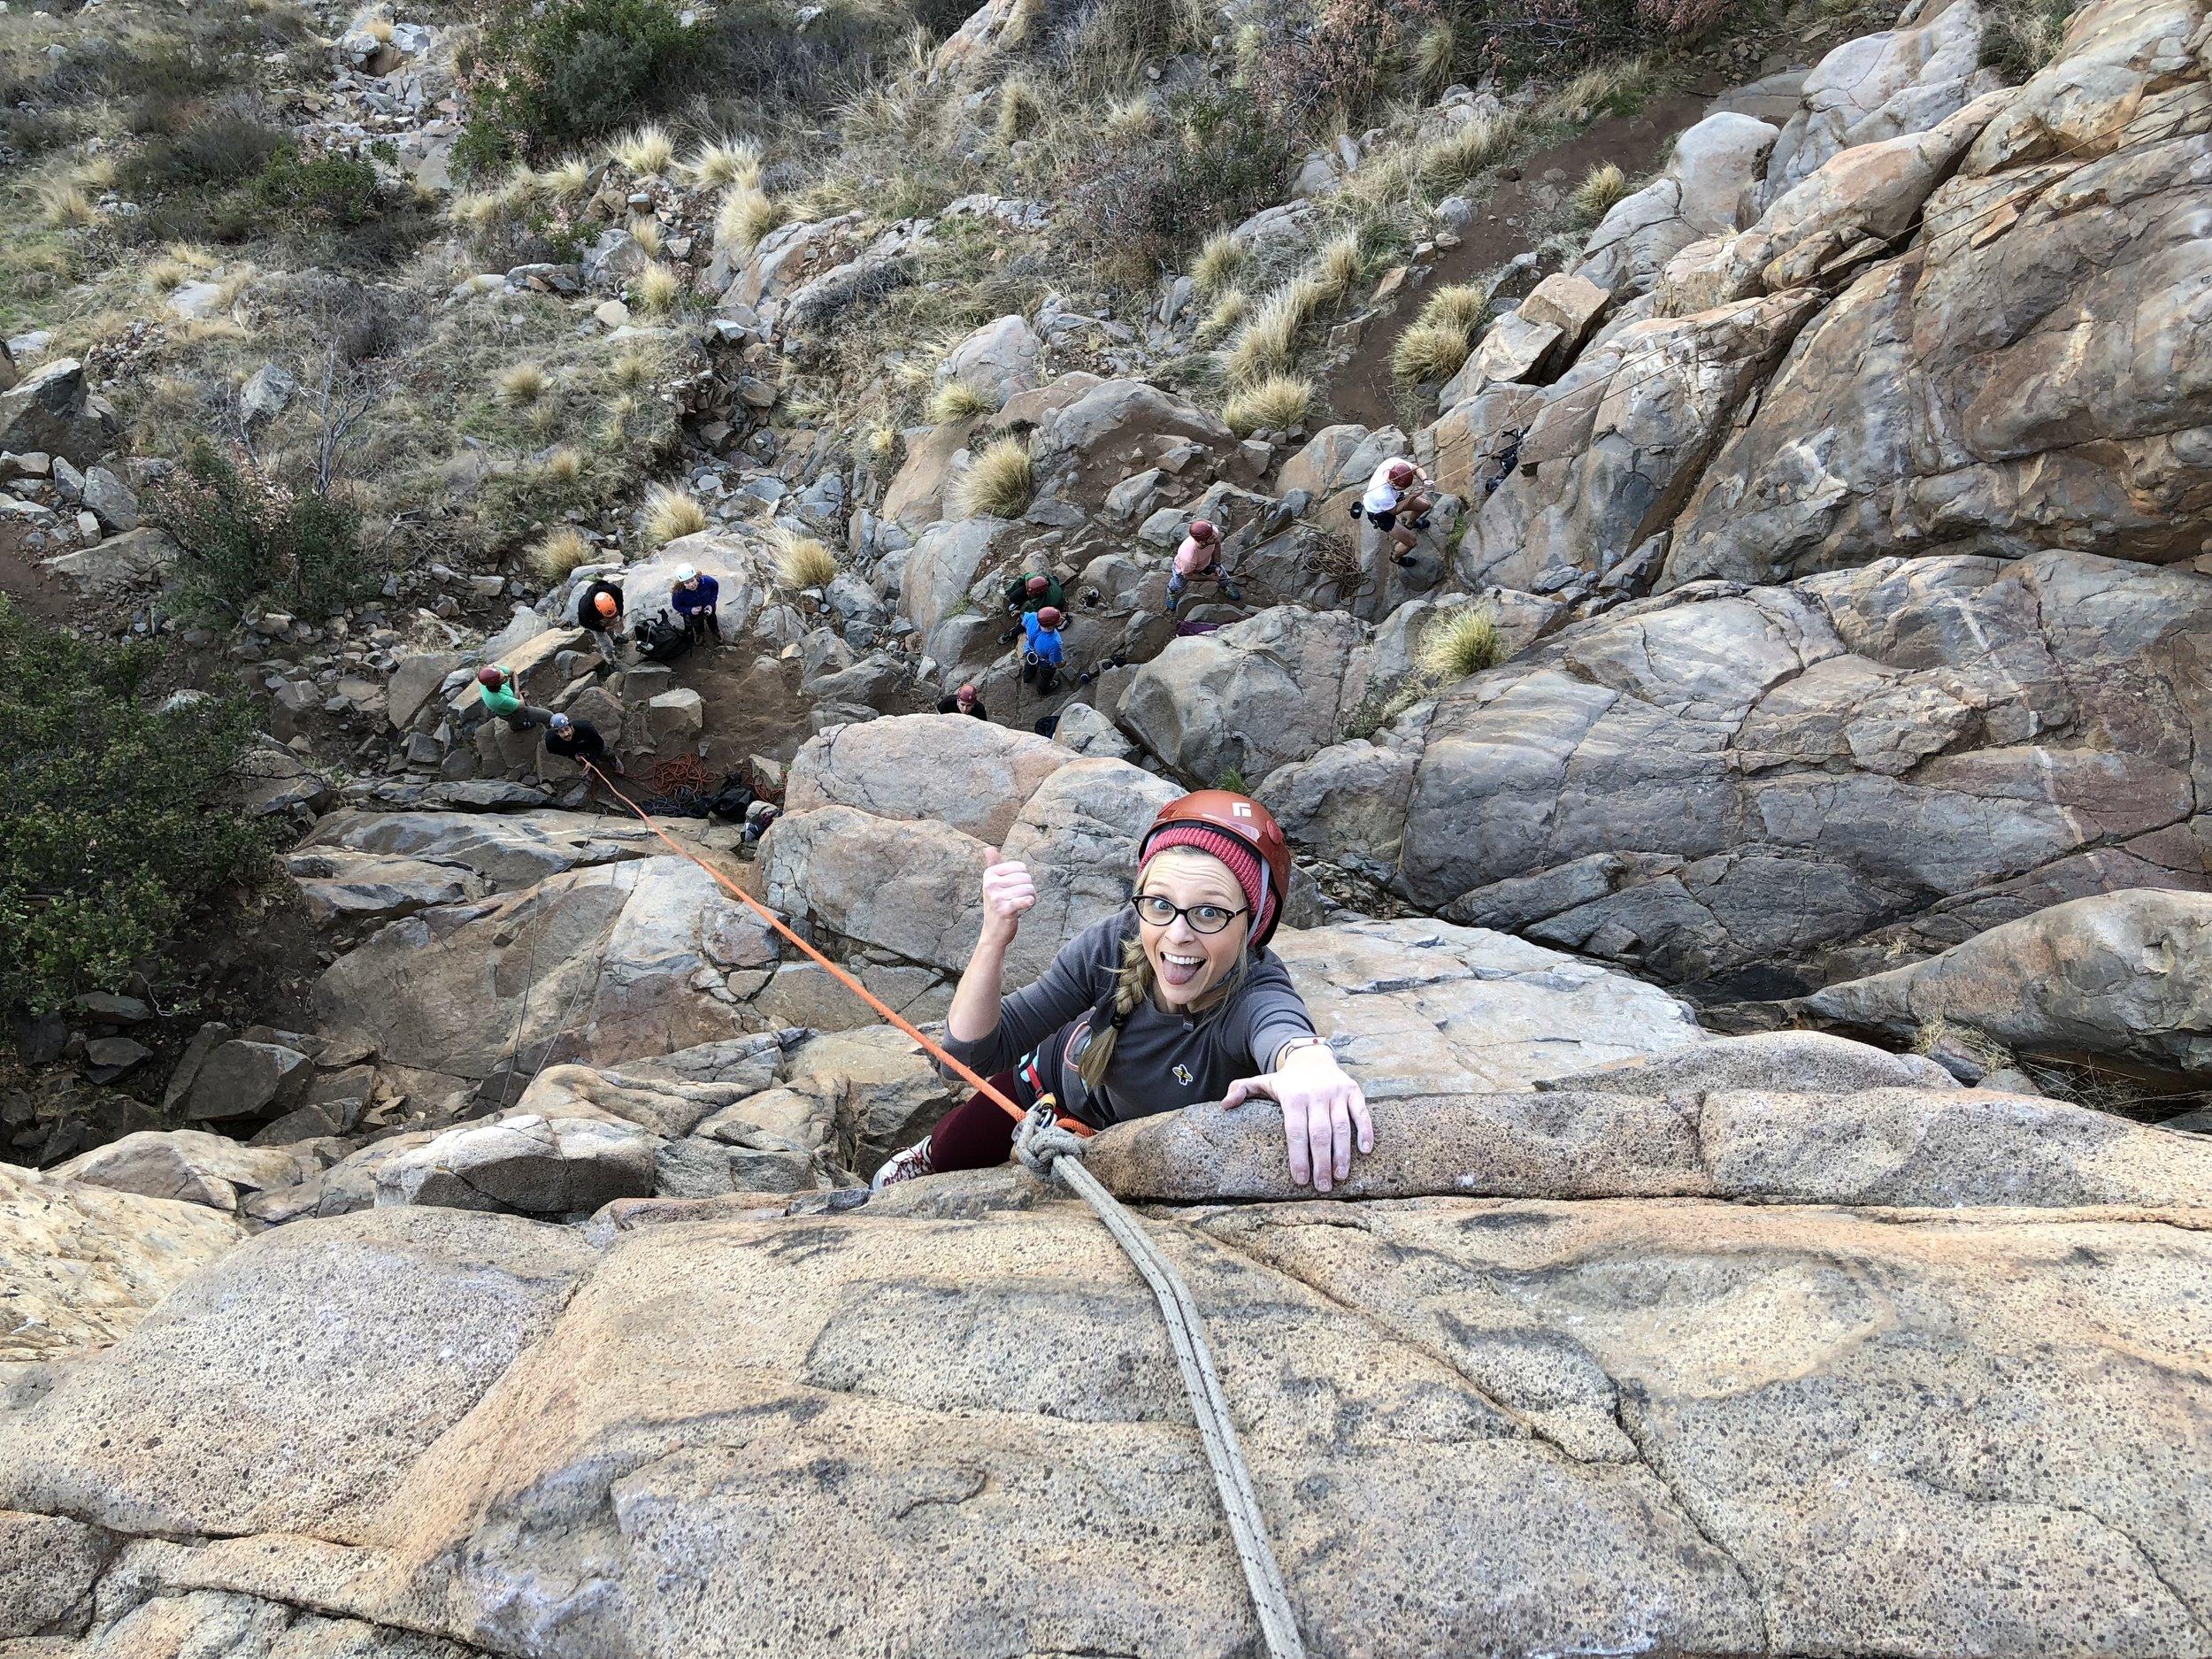 Mission Gorge Rock Climbing